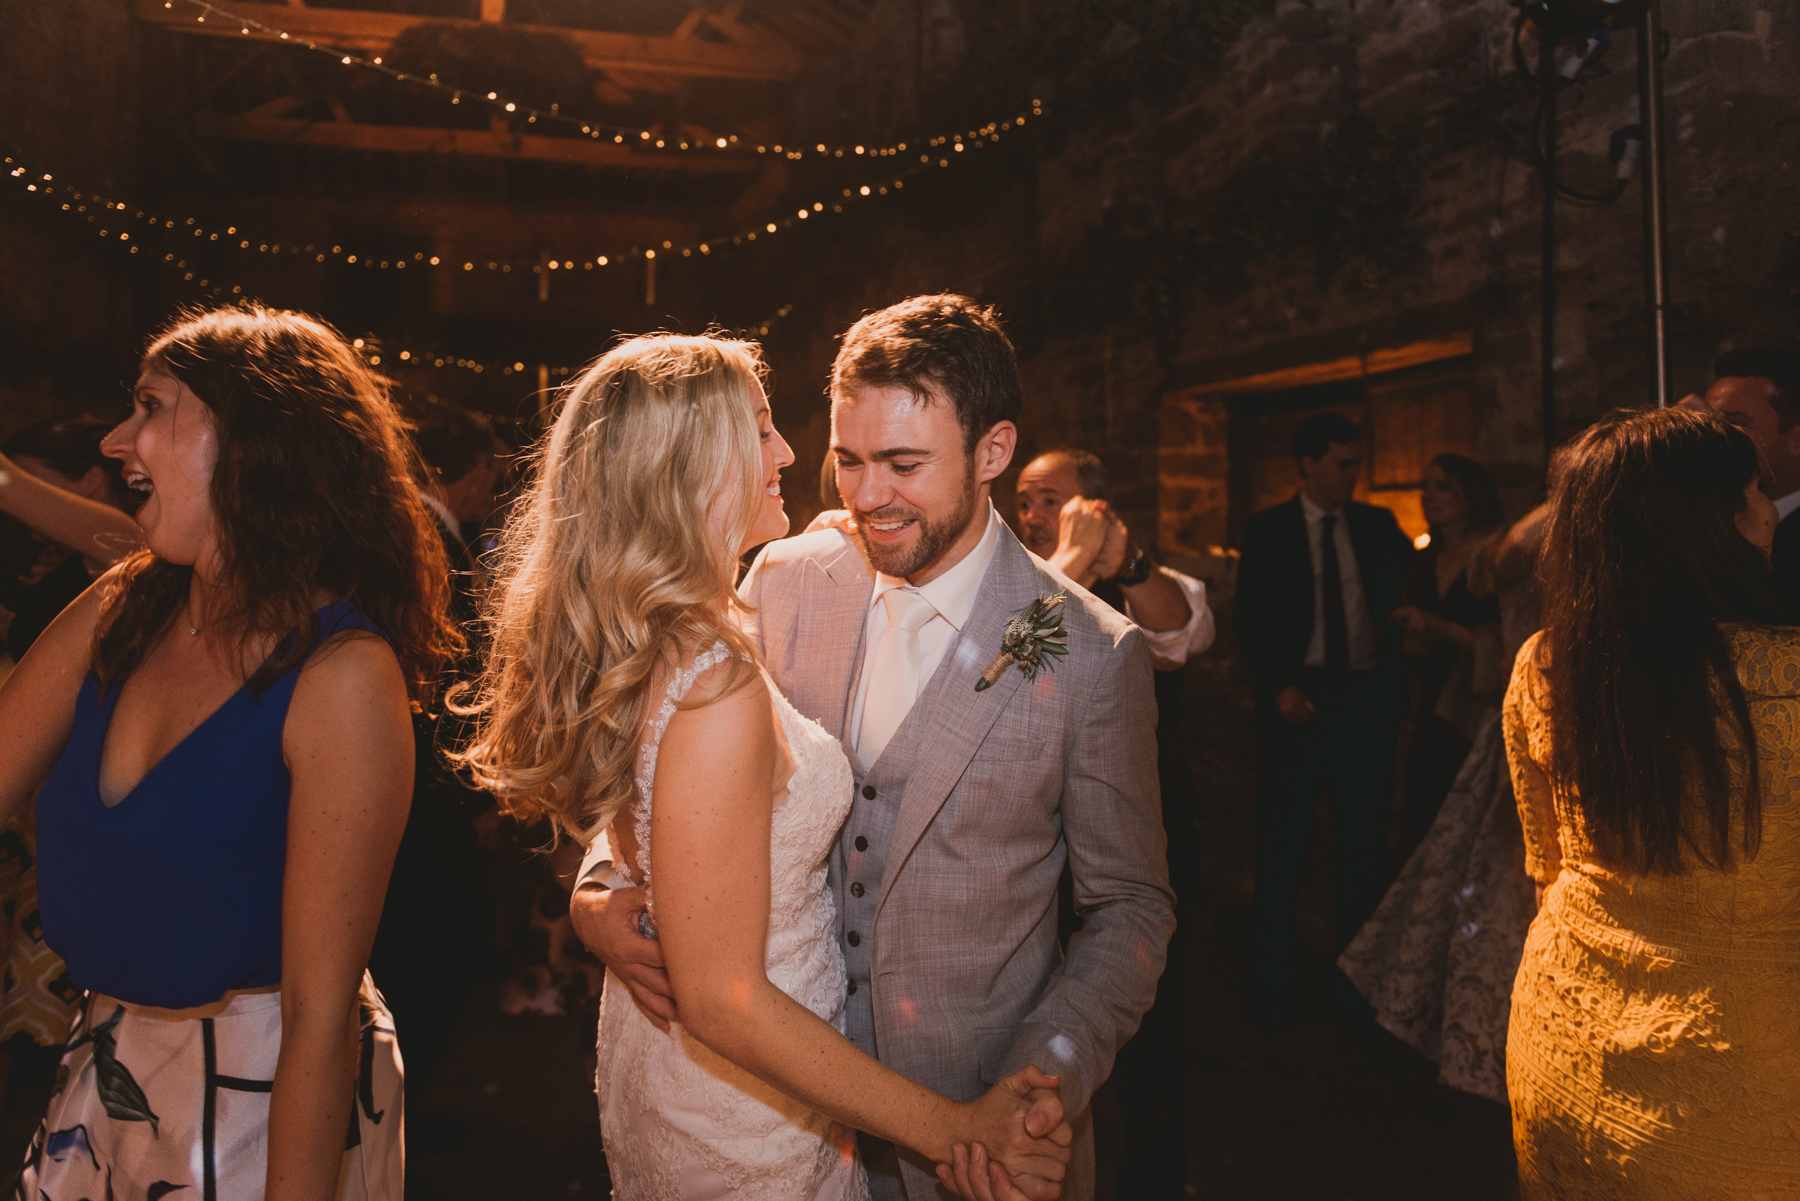 Herefordshire-barn-wedding-highlights-151.jpg